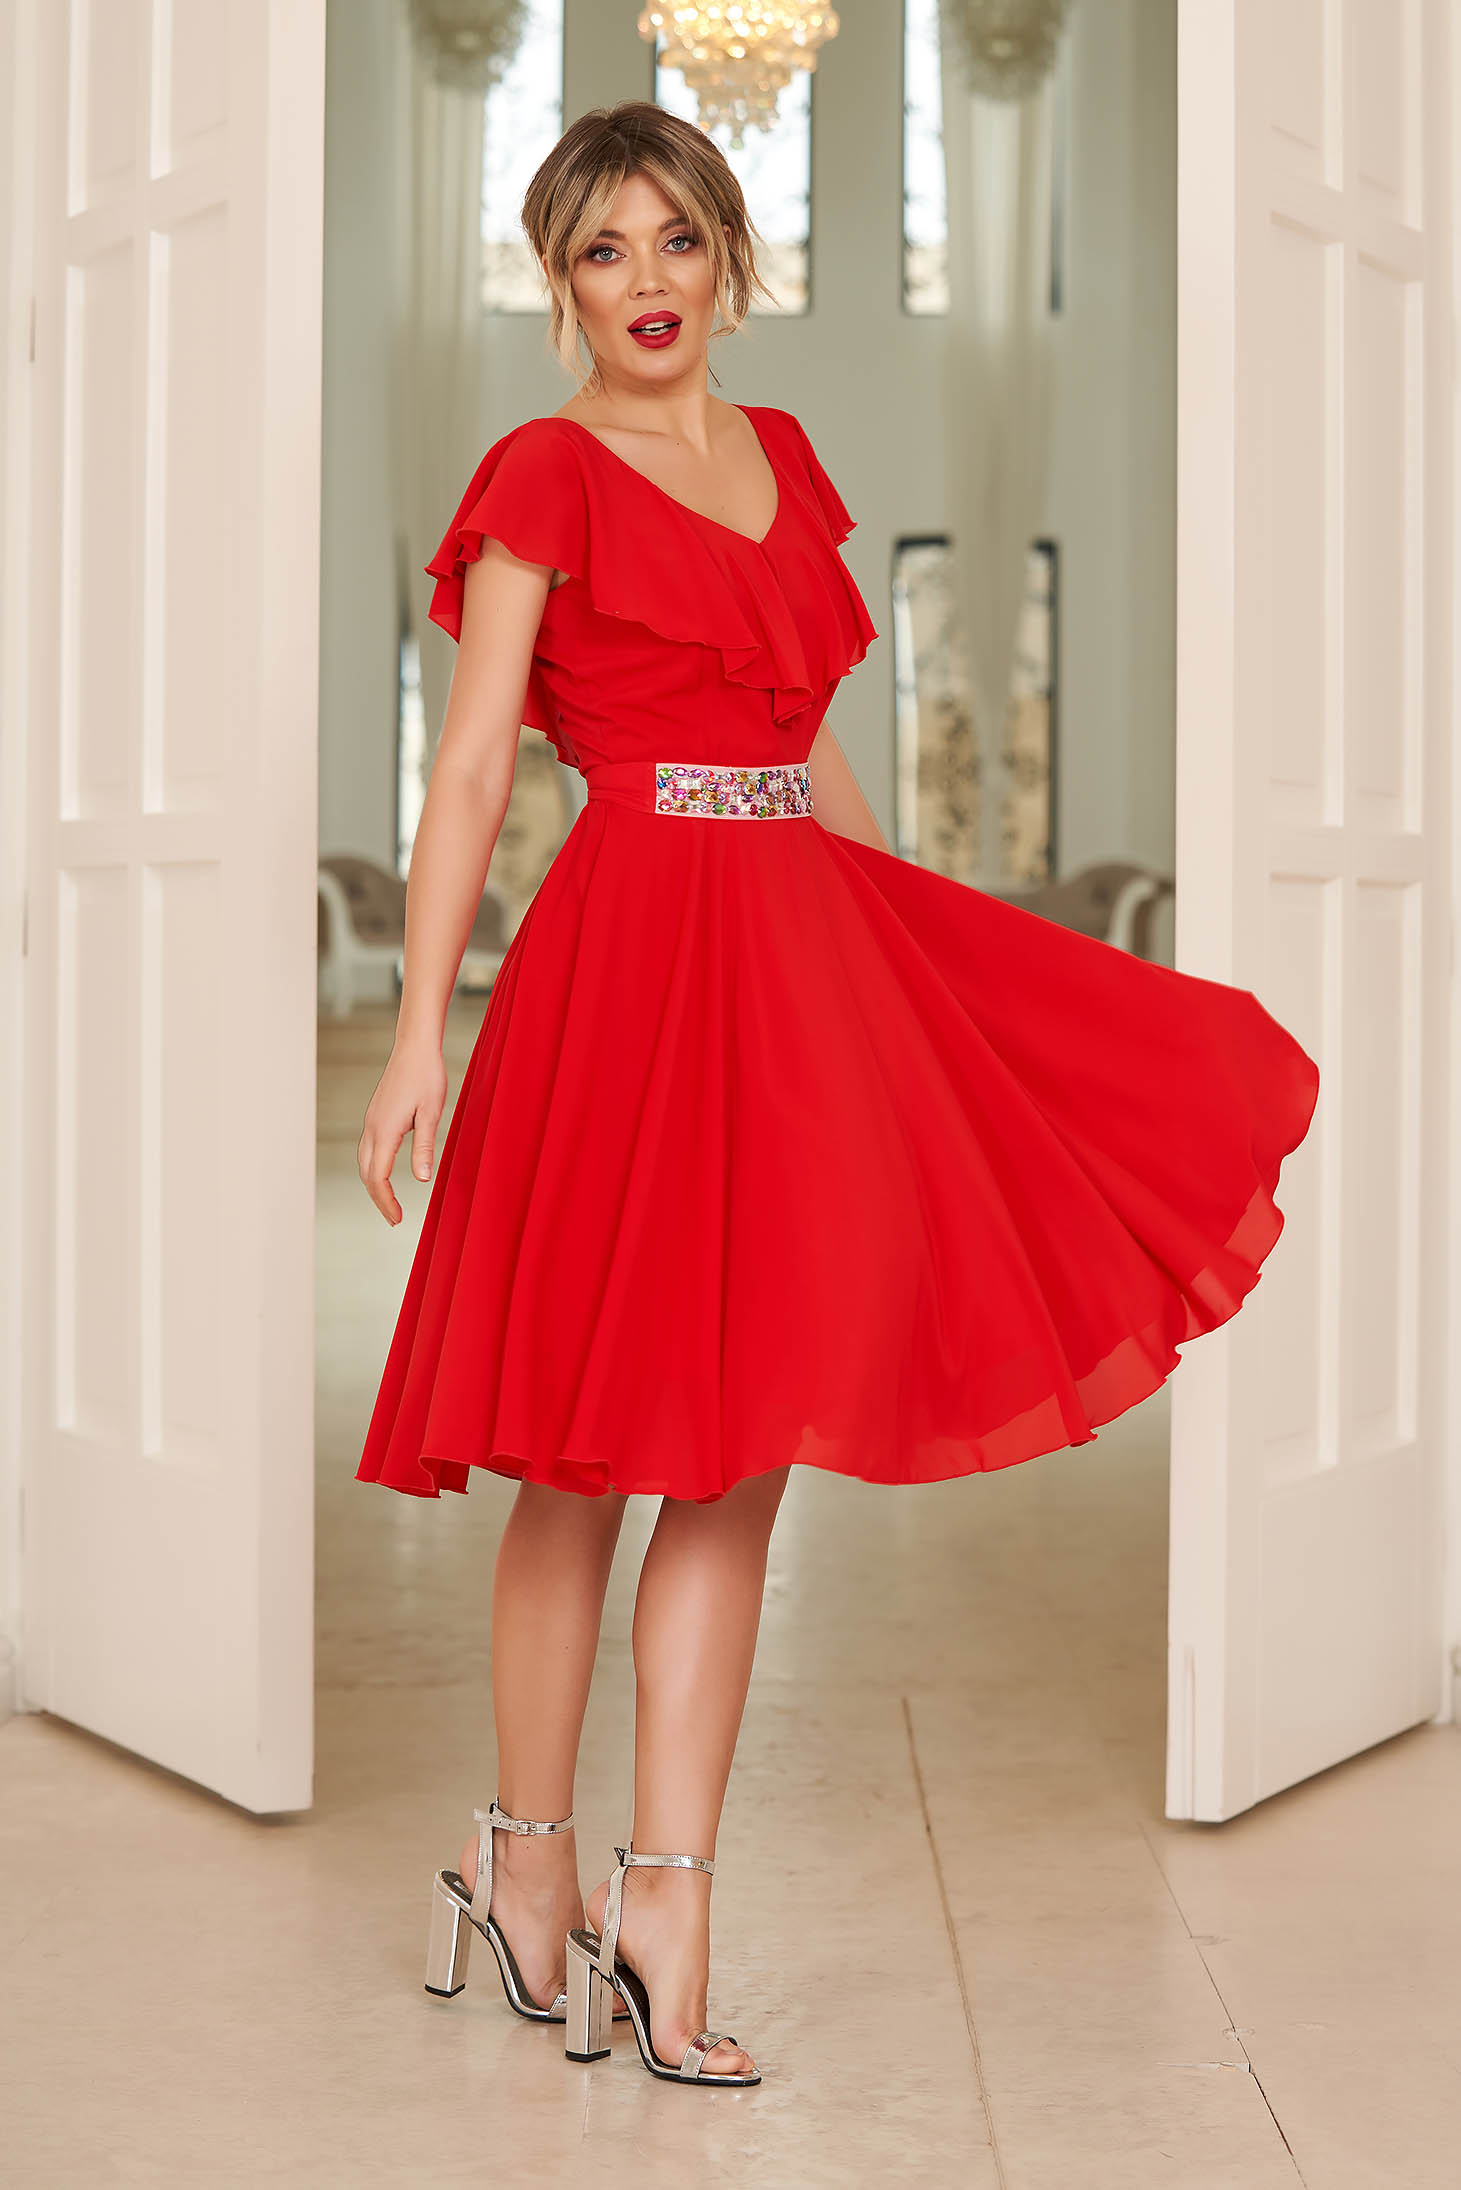 Piros StarShinerS alkalmi fodros harang ruha fátyol anyag övvel ellátva